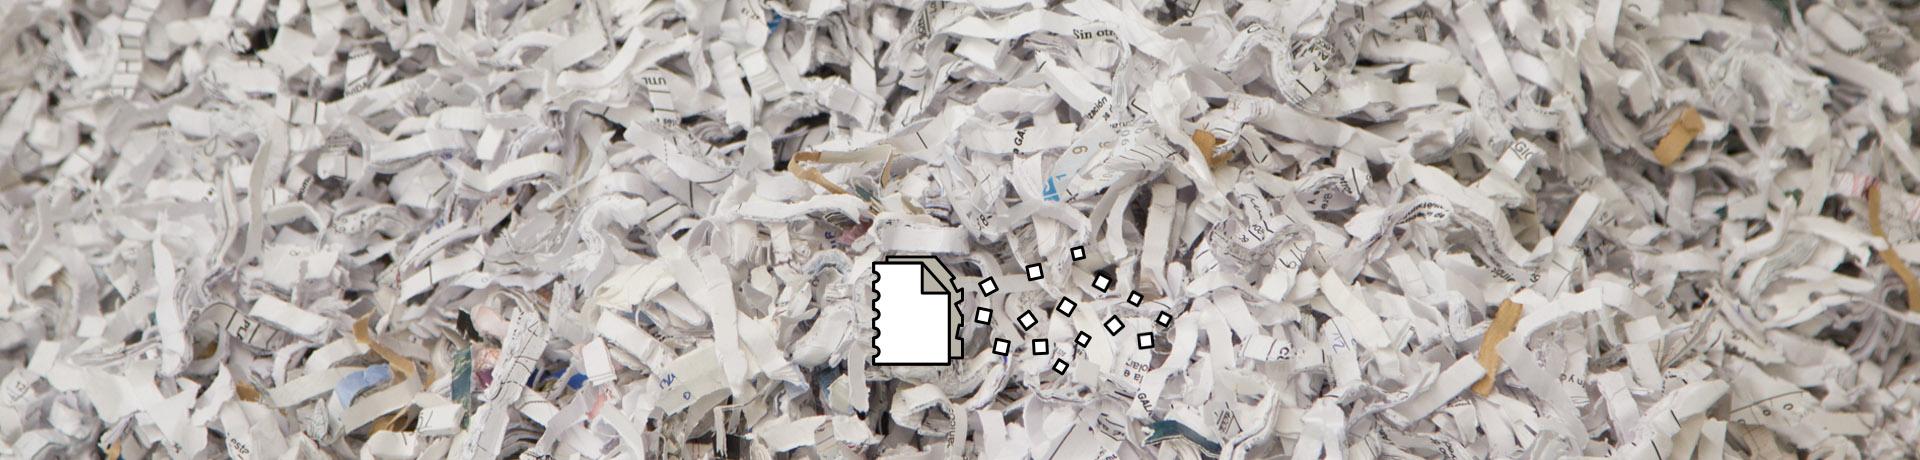 Utramic | Destrucción de Documentos - photo#41